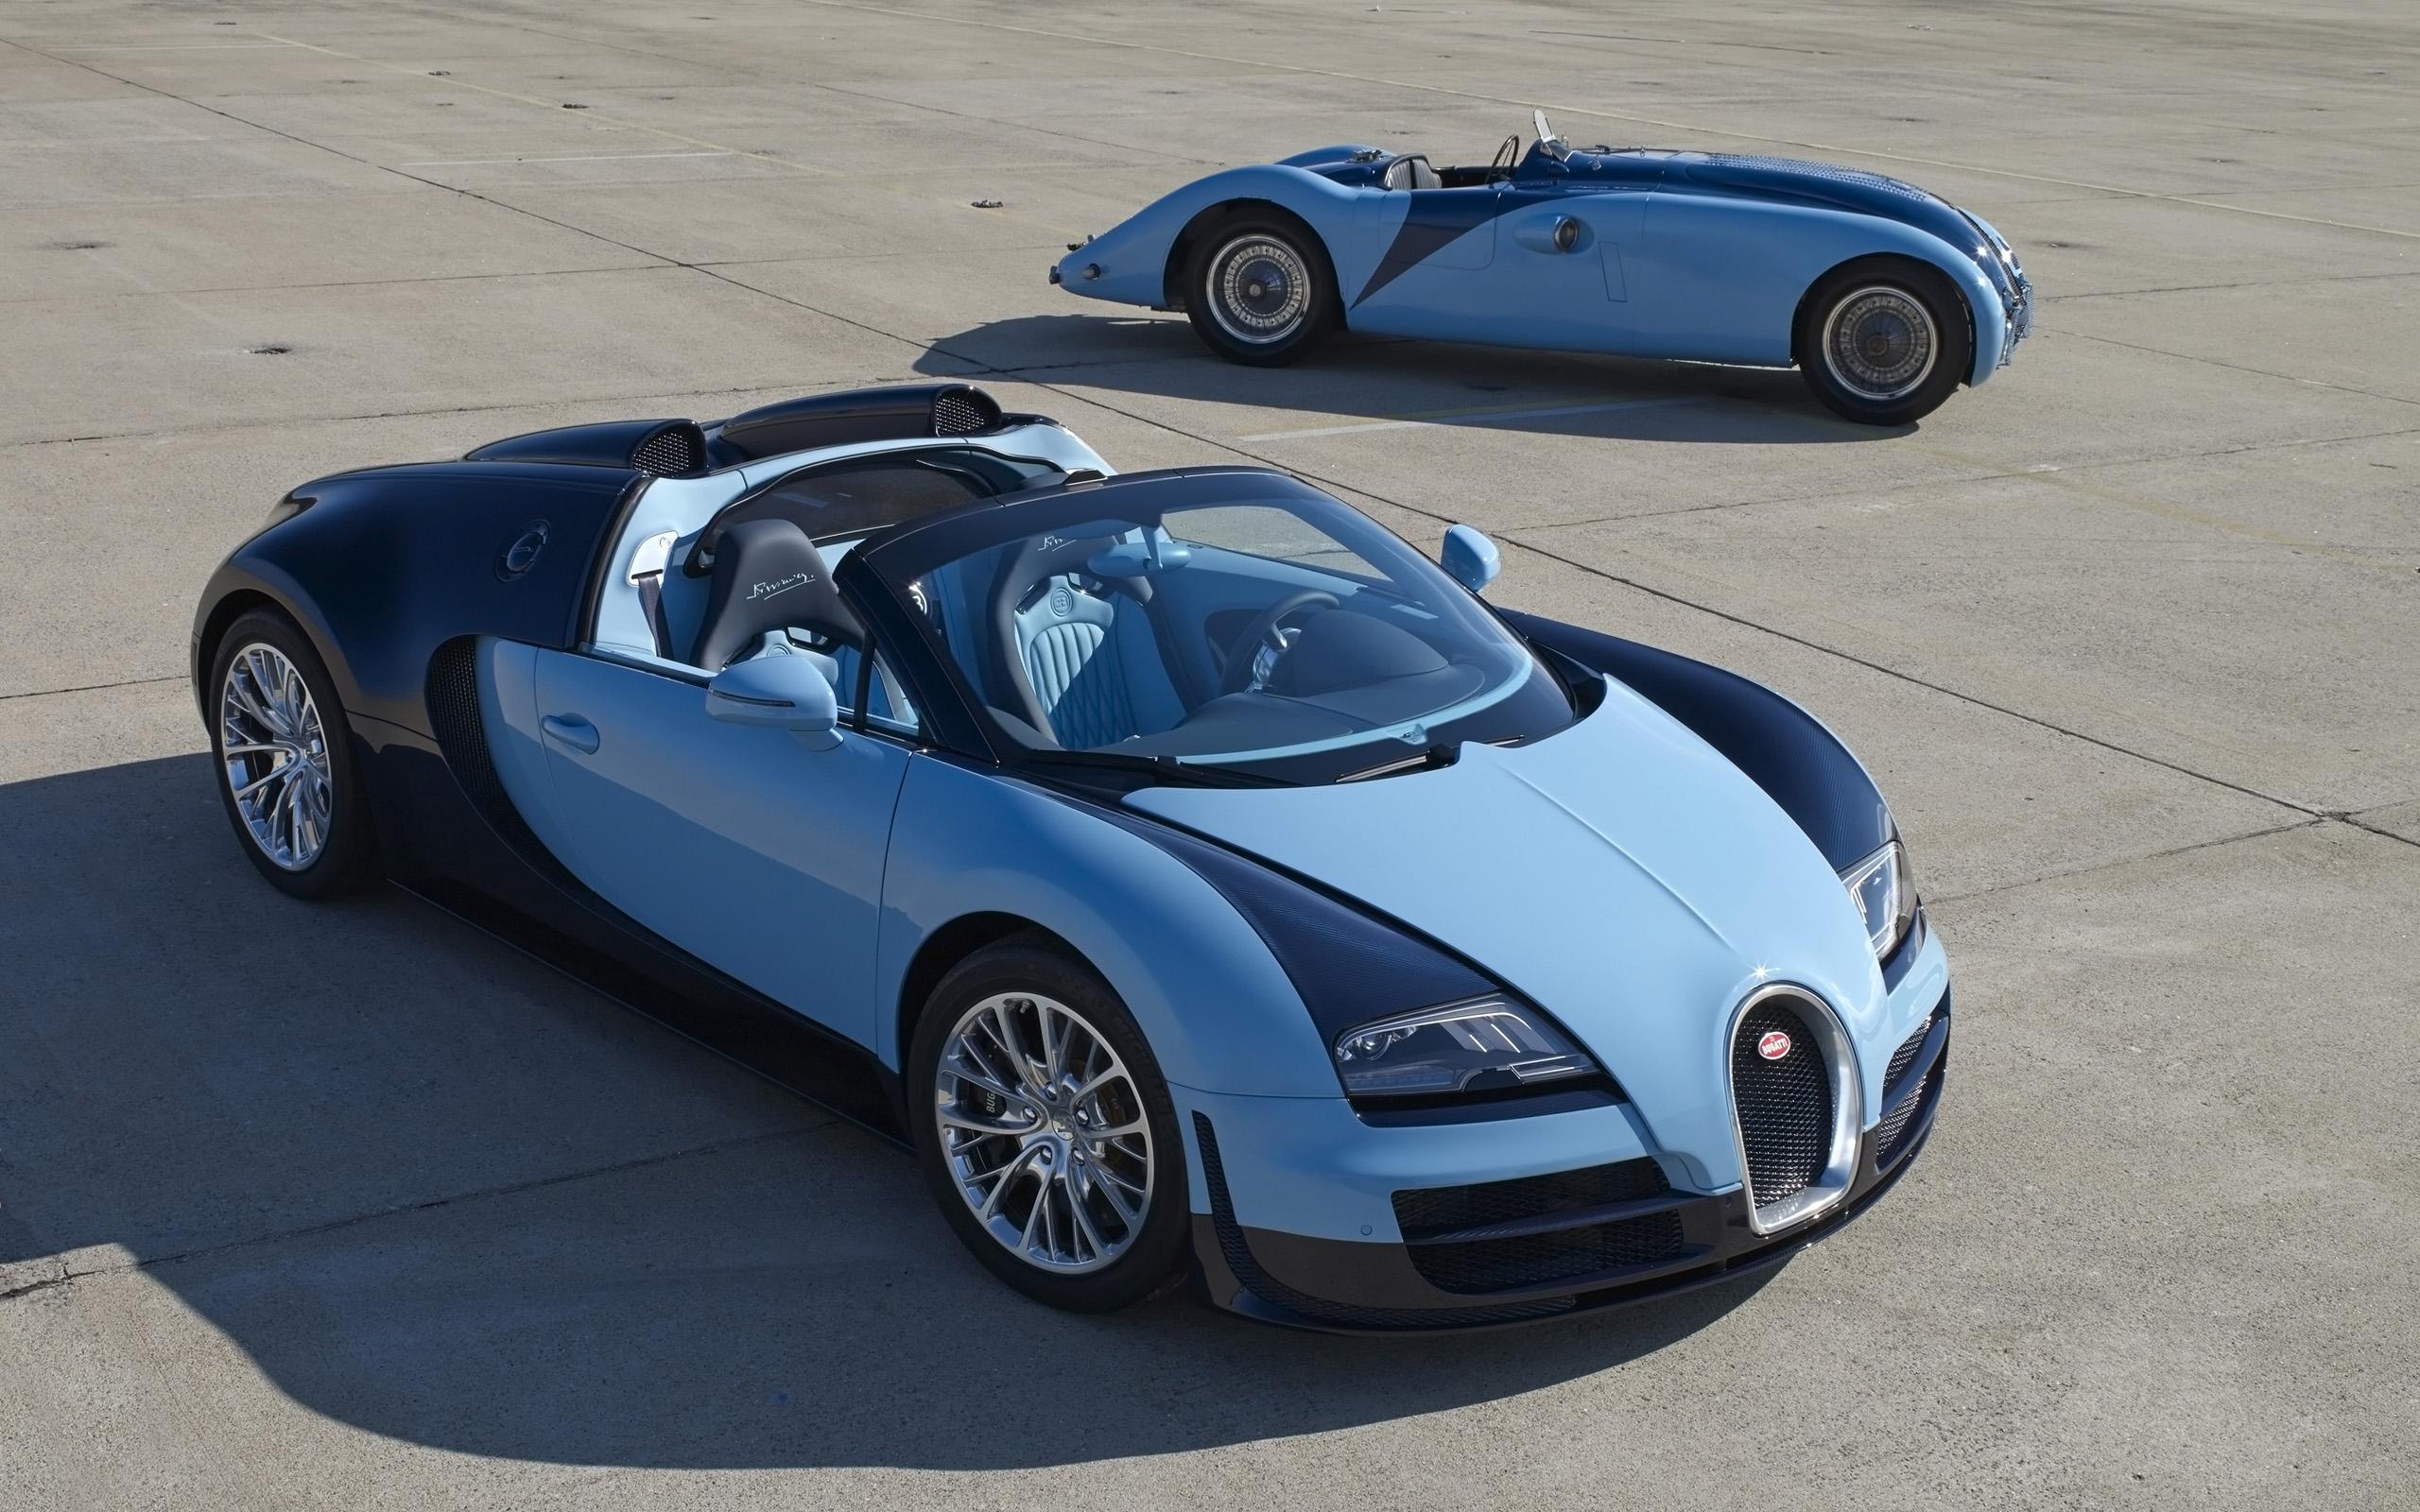 bugatti-veyron-grand-sport-vitesse-legend-jean-pierre-wimille-Bugatti-Veyro-wallpaper-wp3403552